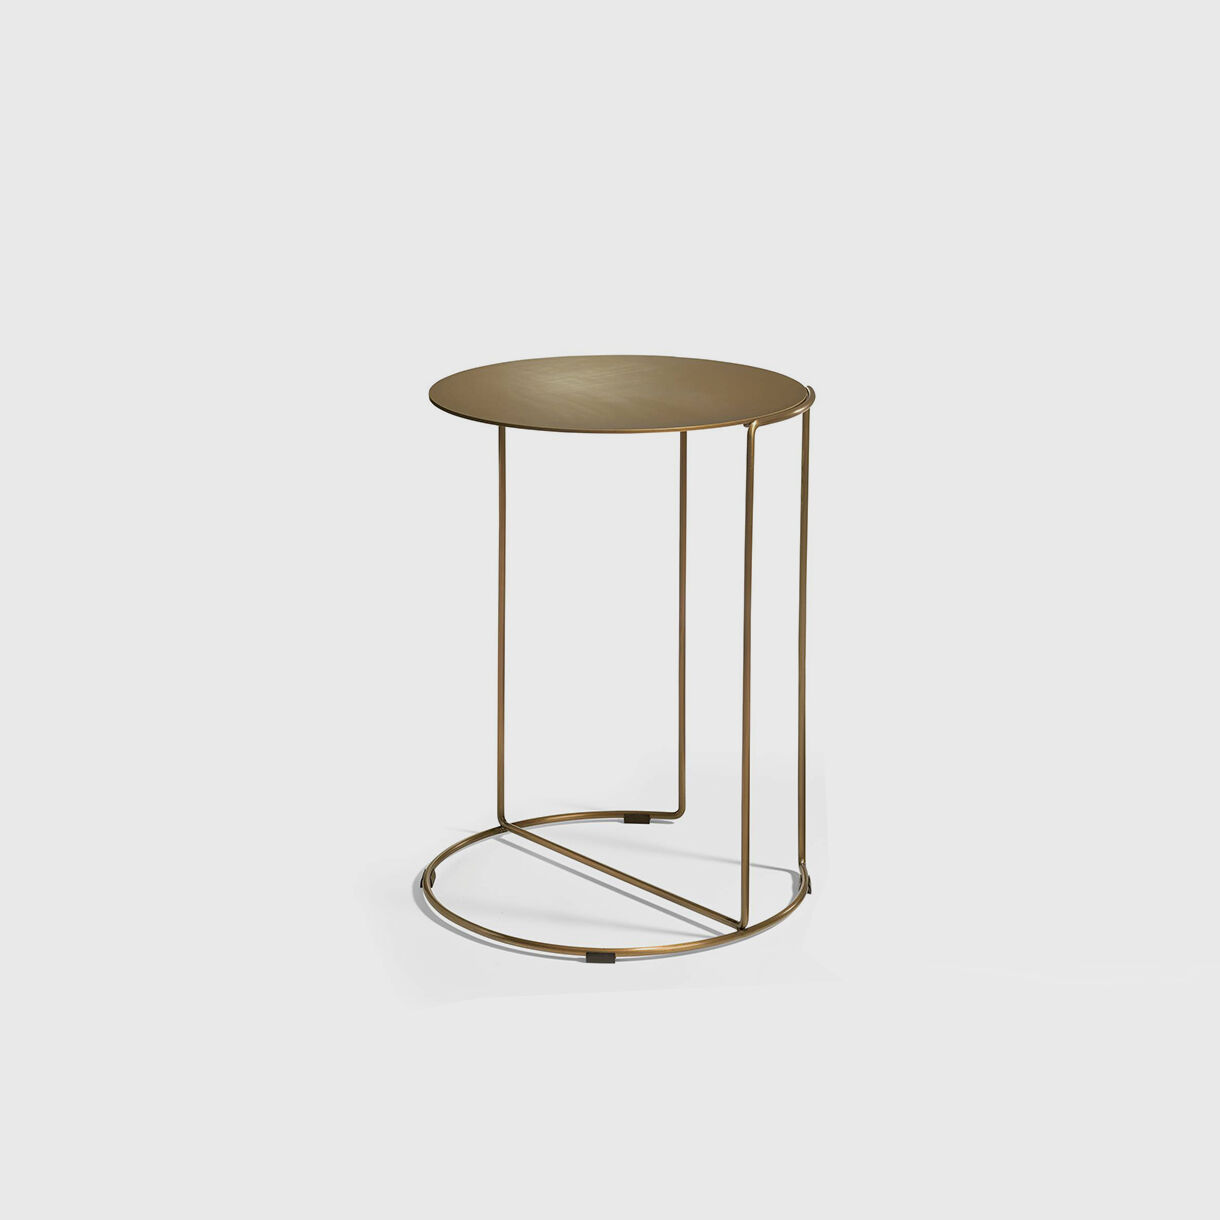 Oki Round Side Table, T4, Brass